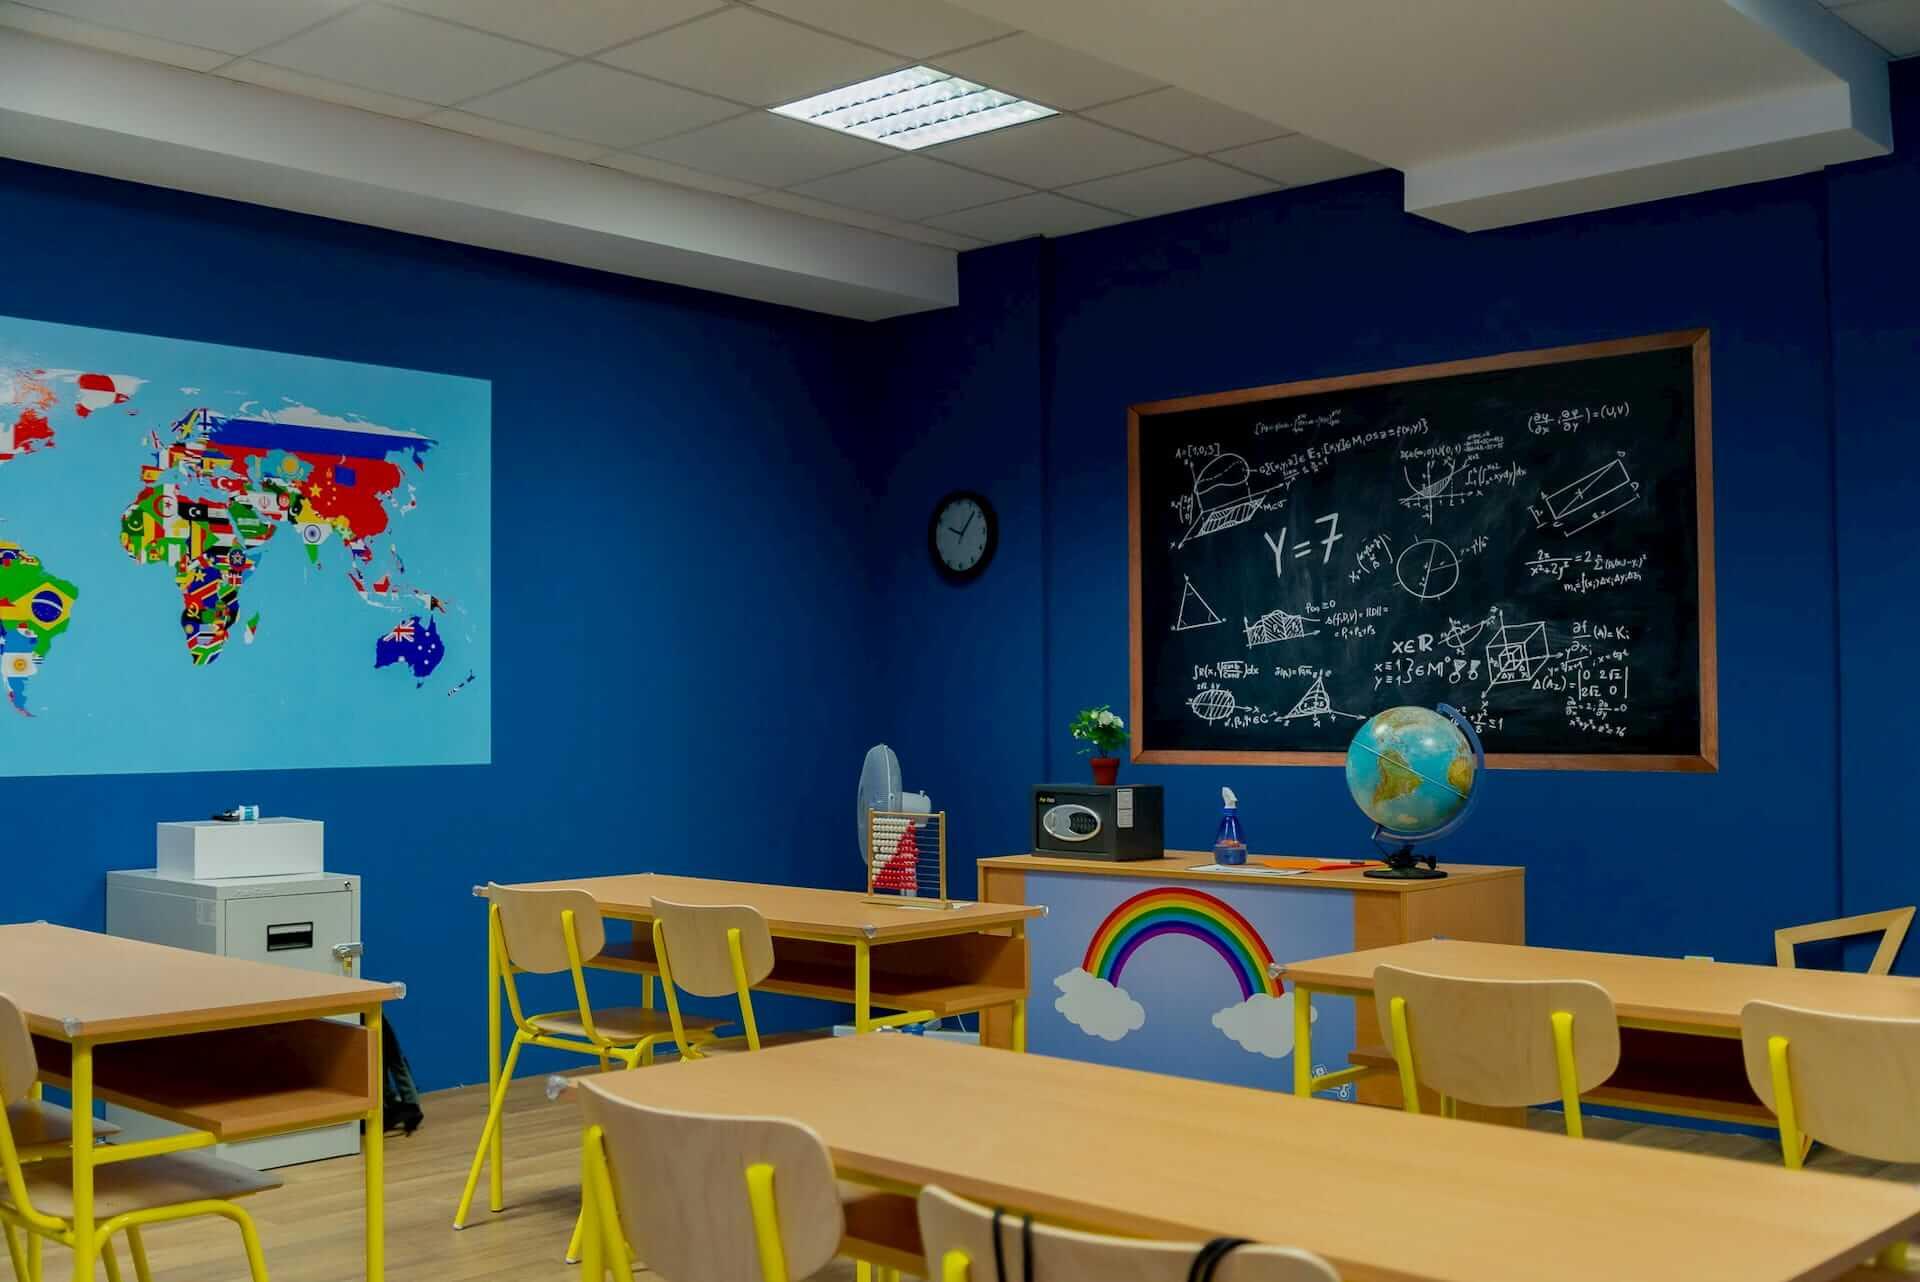 Alien invasion classroom